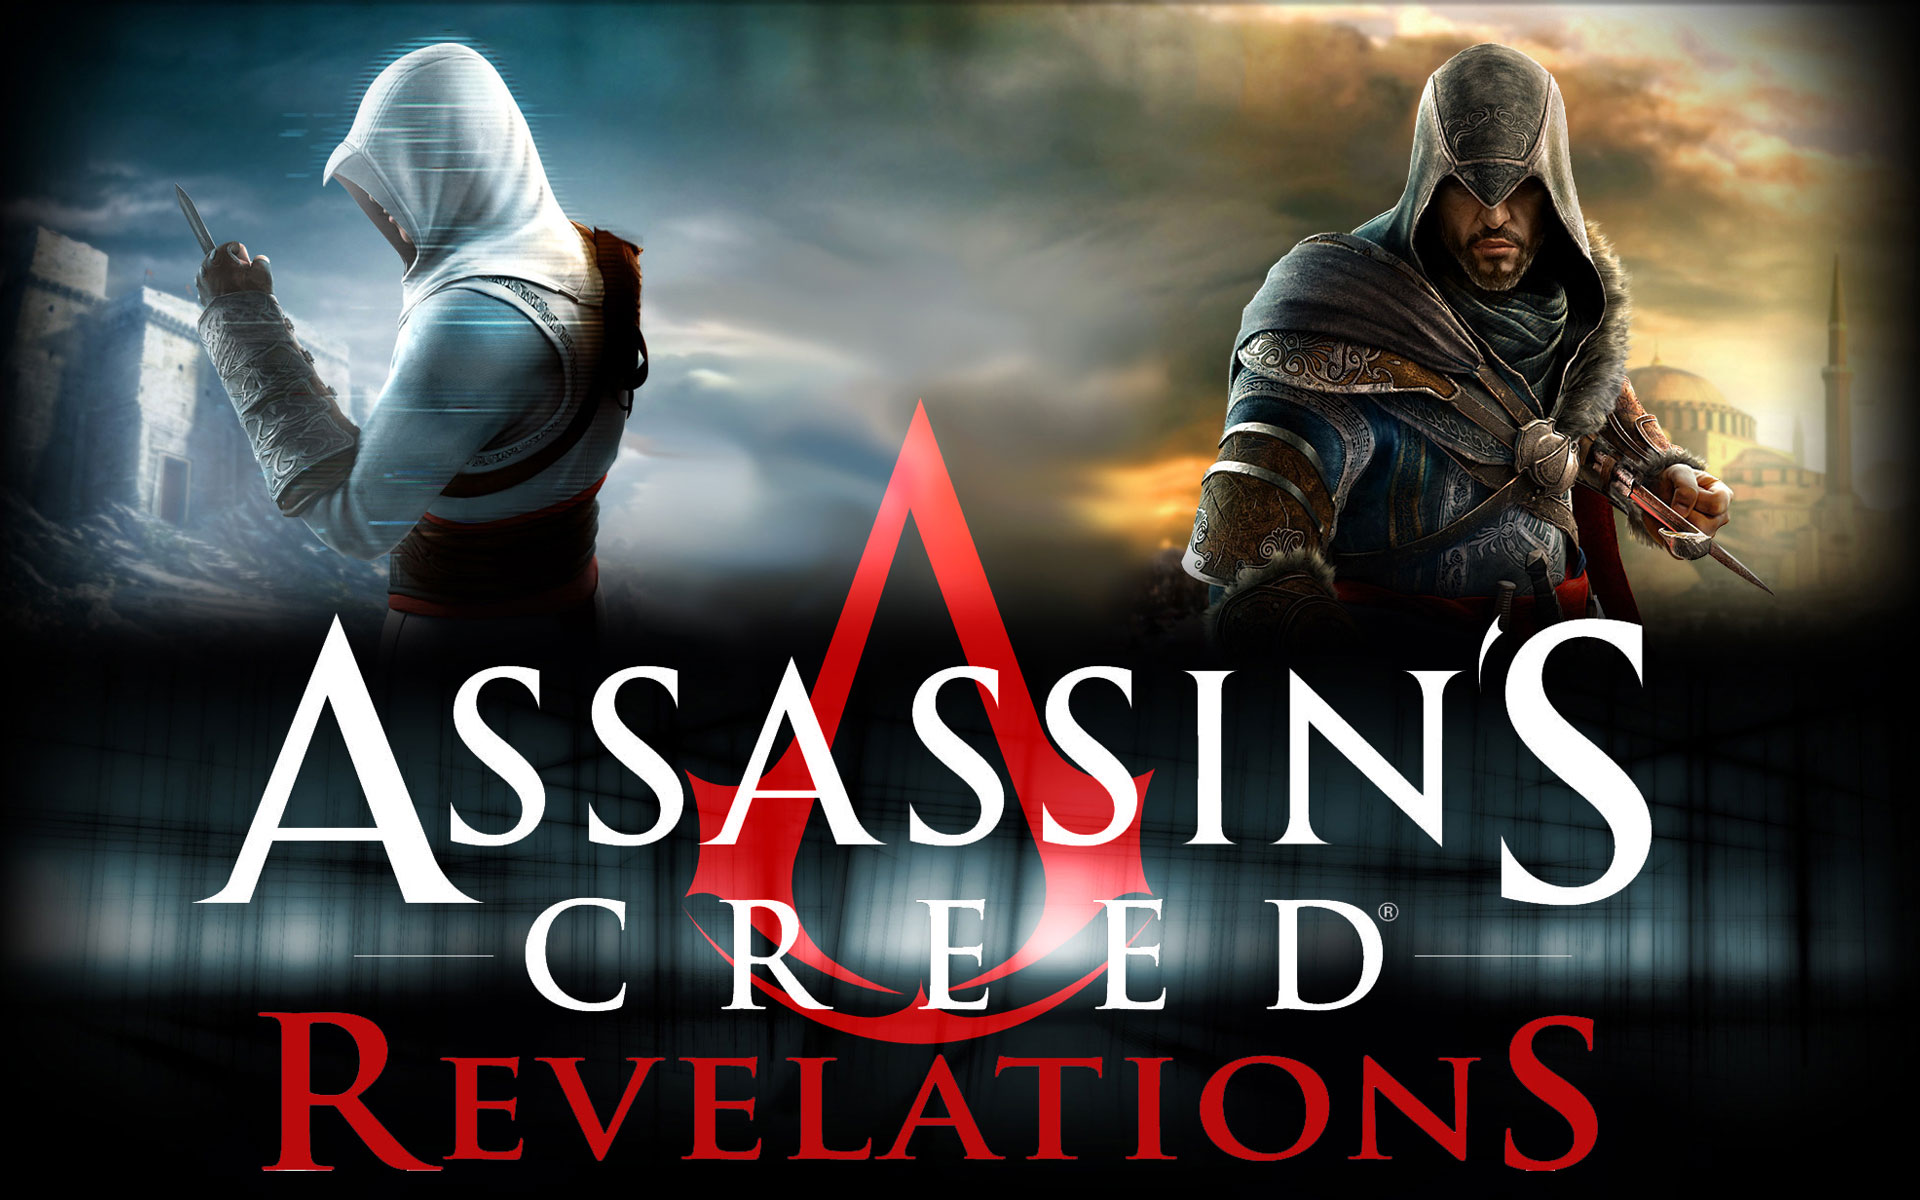 Assassins Creed Rvlations LAntre de LuCioLe 1920x1200